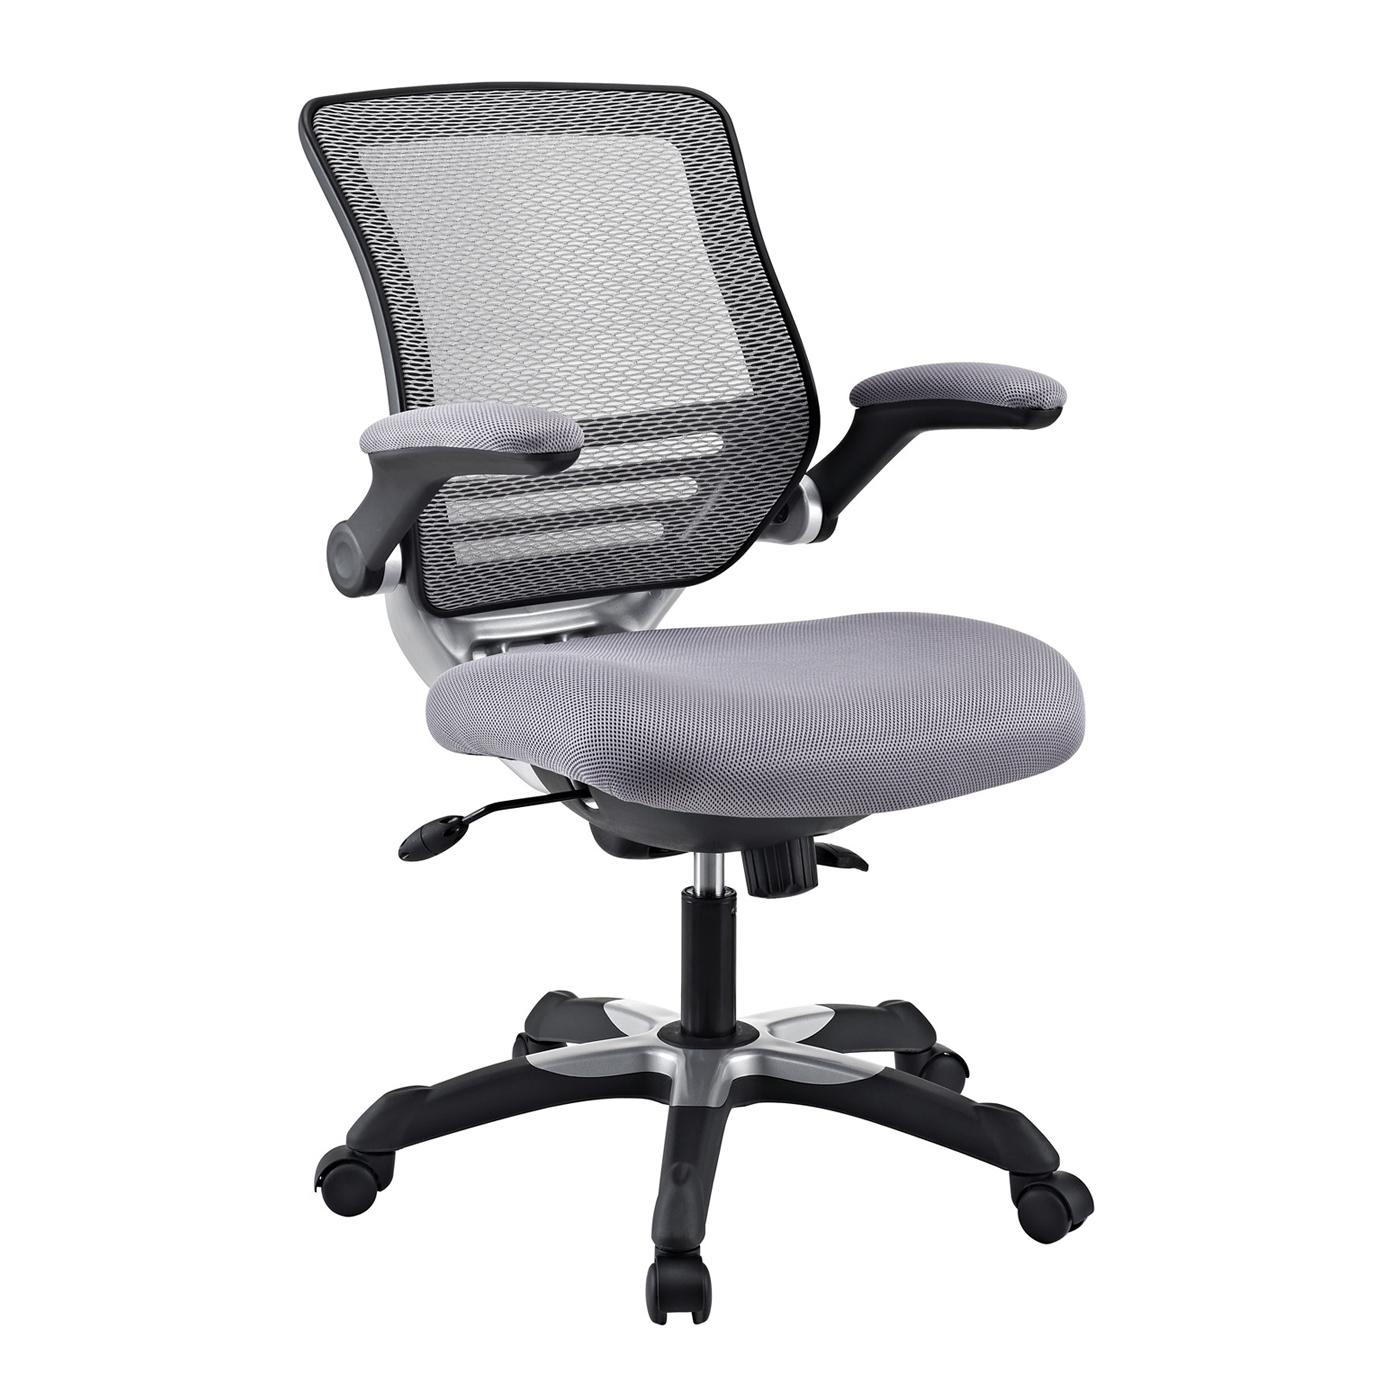 Houseofauracom Ergonomic Computer Desk Chair Brown Pu  : ergonomiccomputerofficechair9 from houseofaura.com size 1400 x 1400 jpeg 424kB